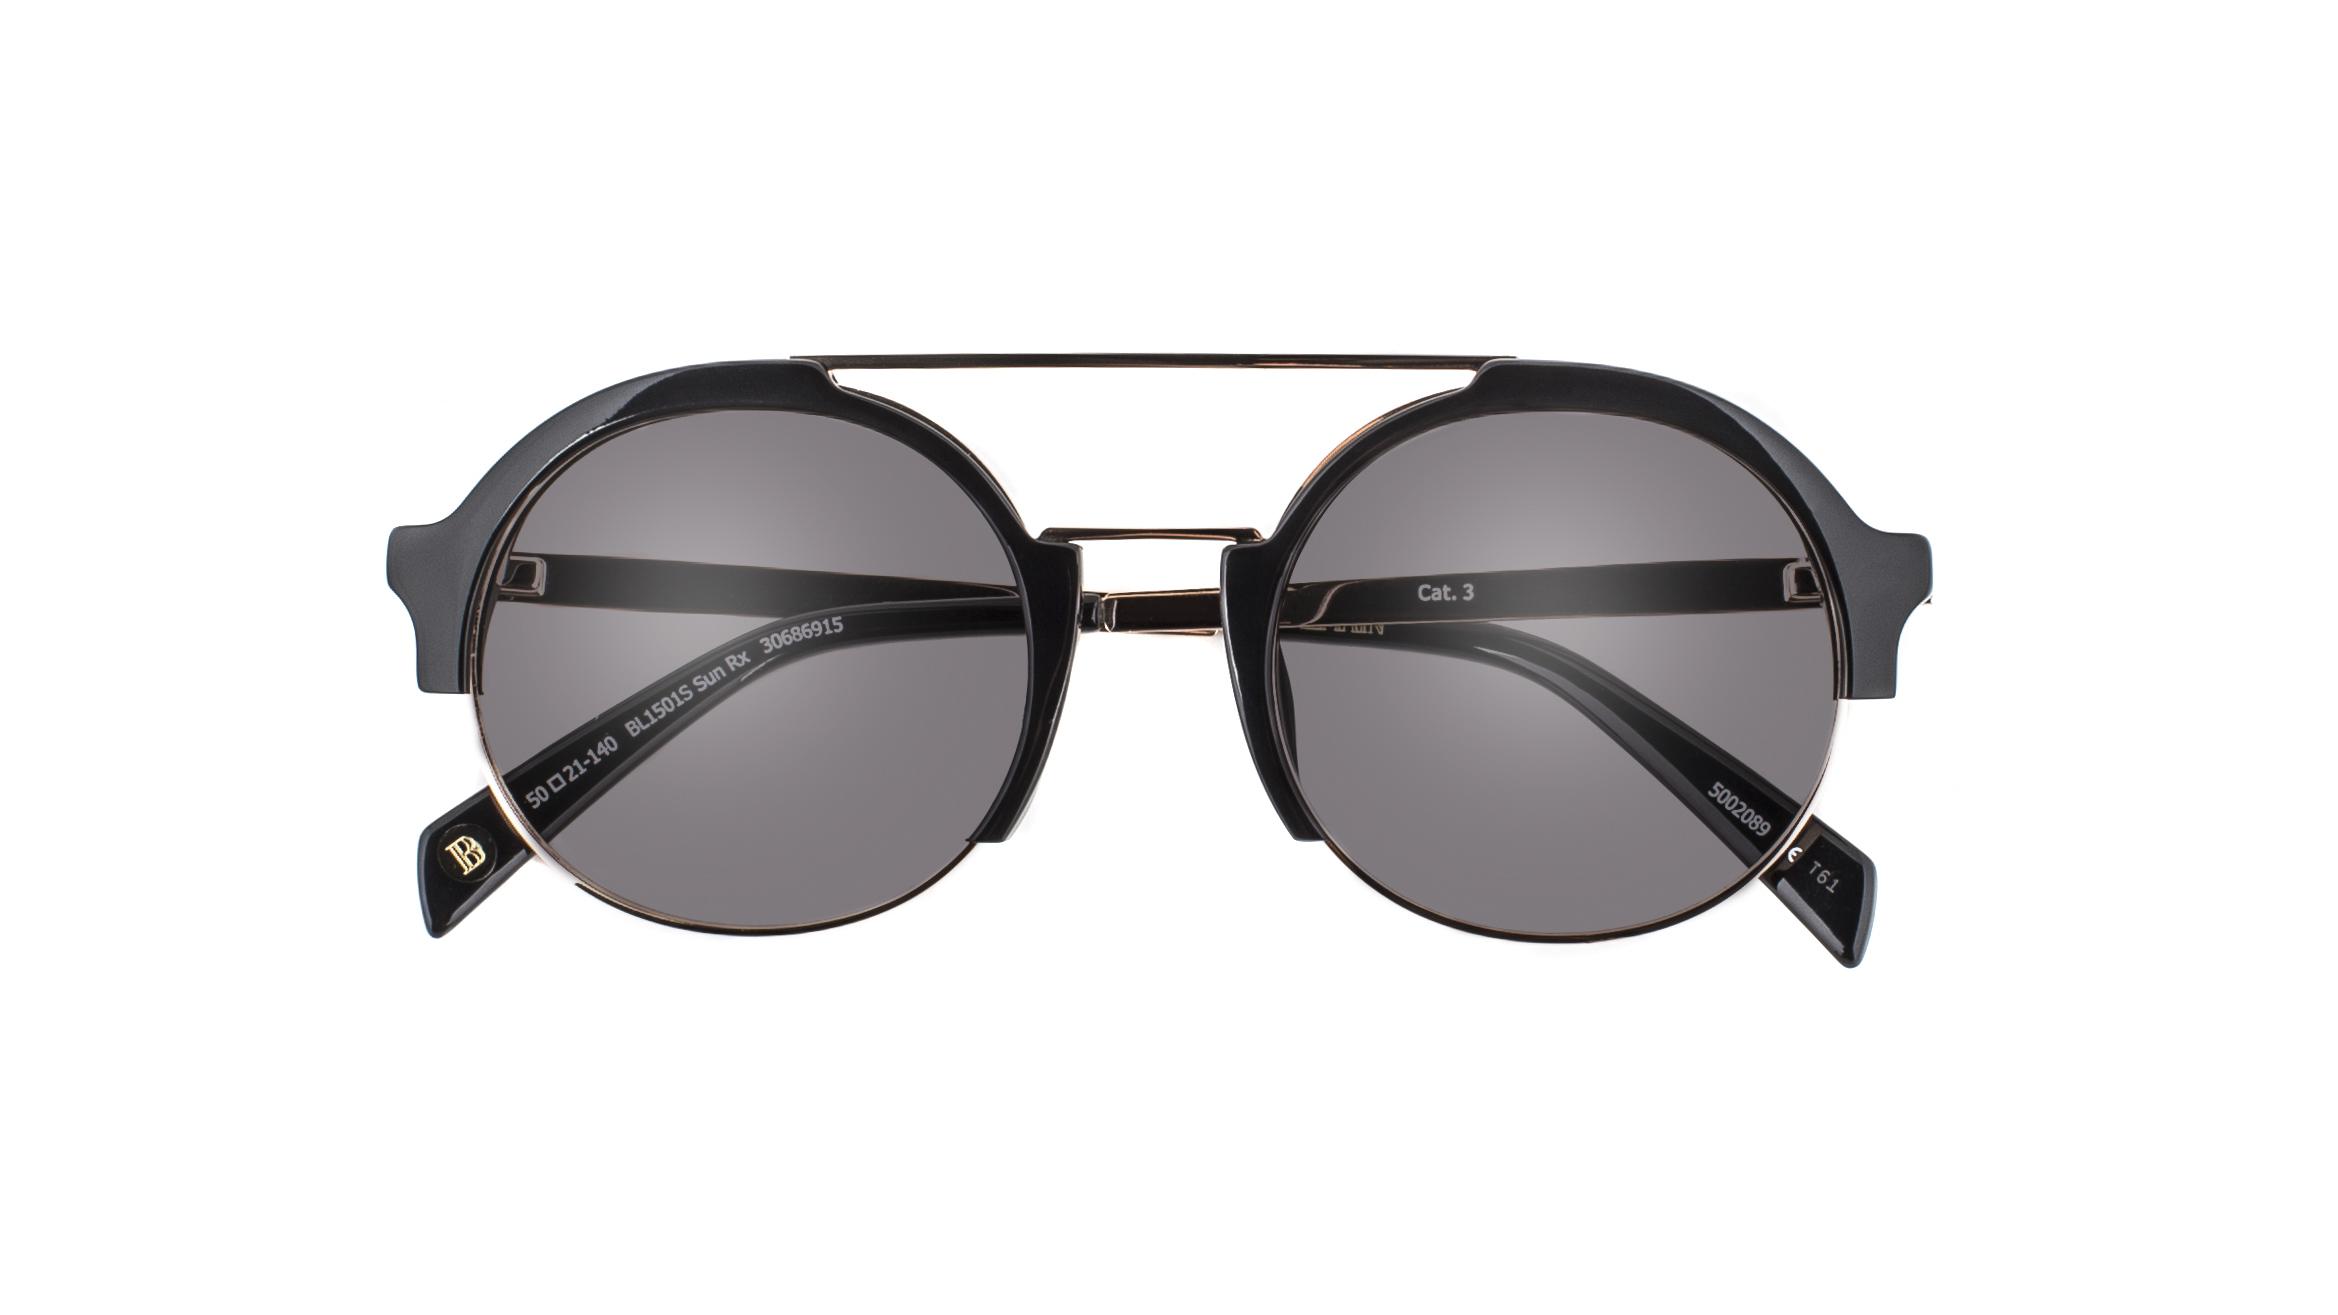 Balmain x Specsavers BL1501S SUN RX 30686915 - RRP 2 pairs single vision $459